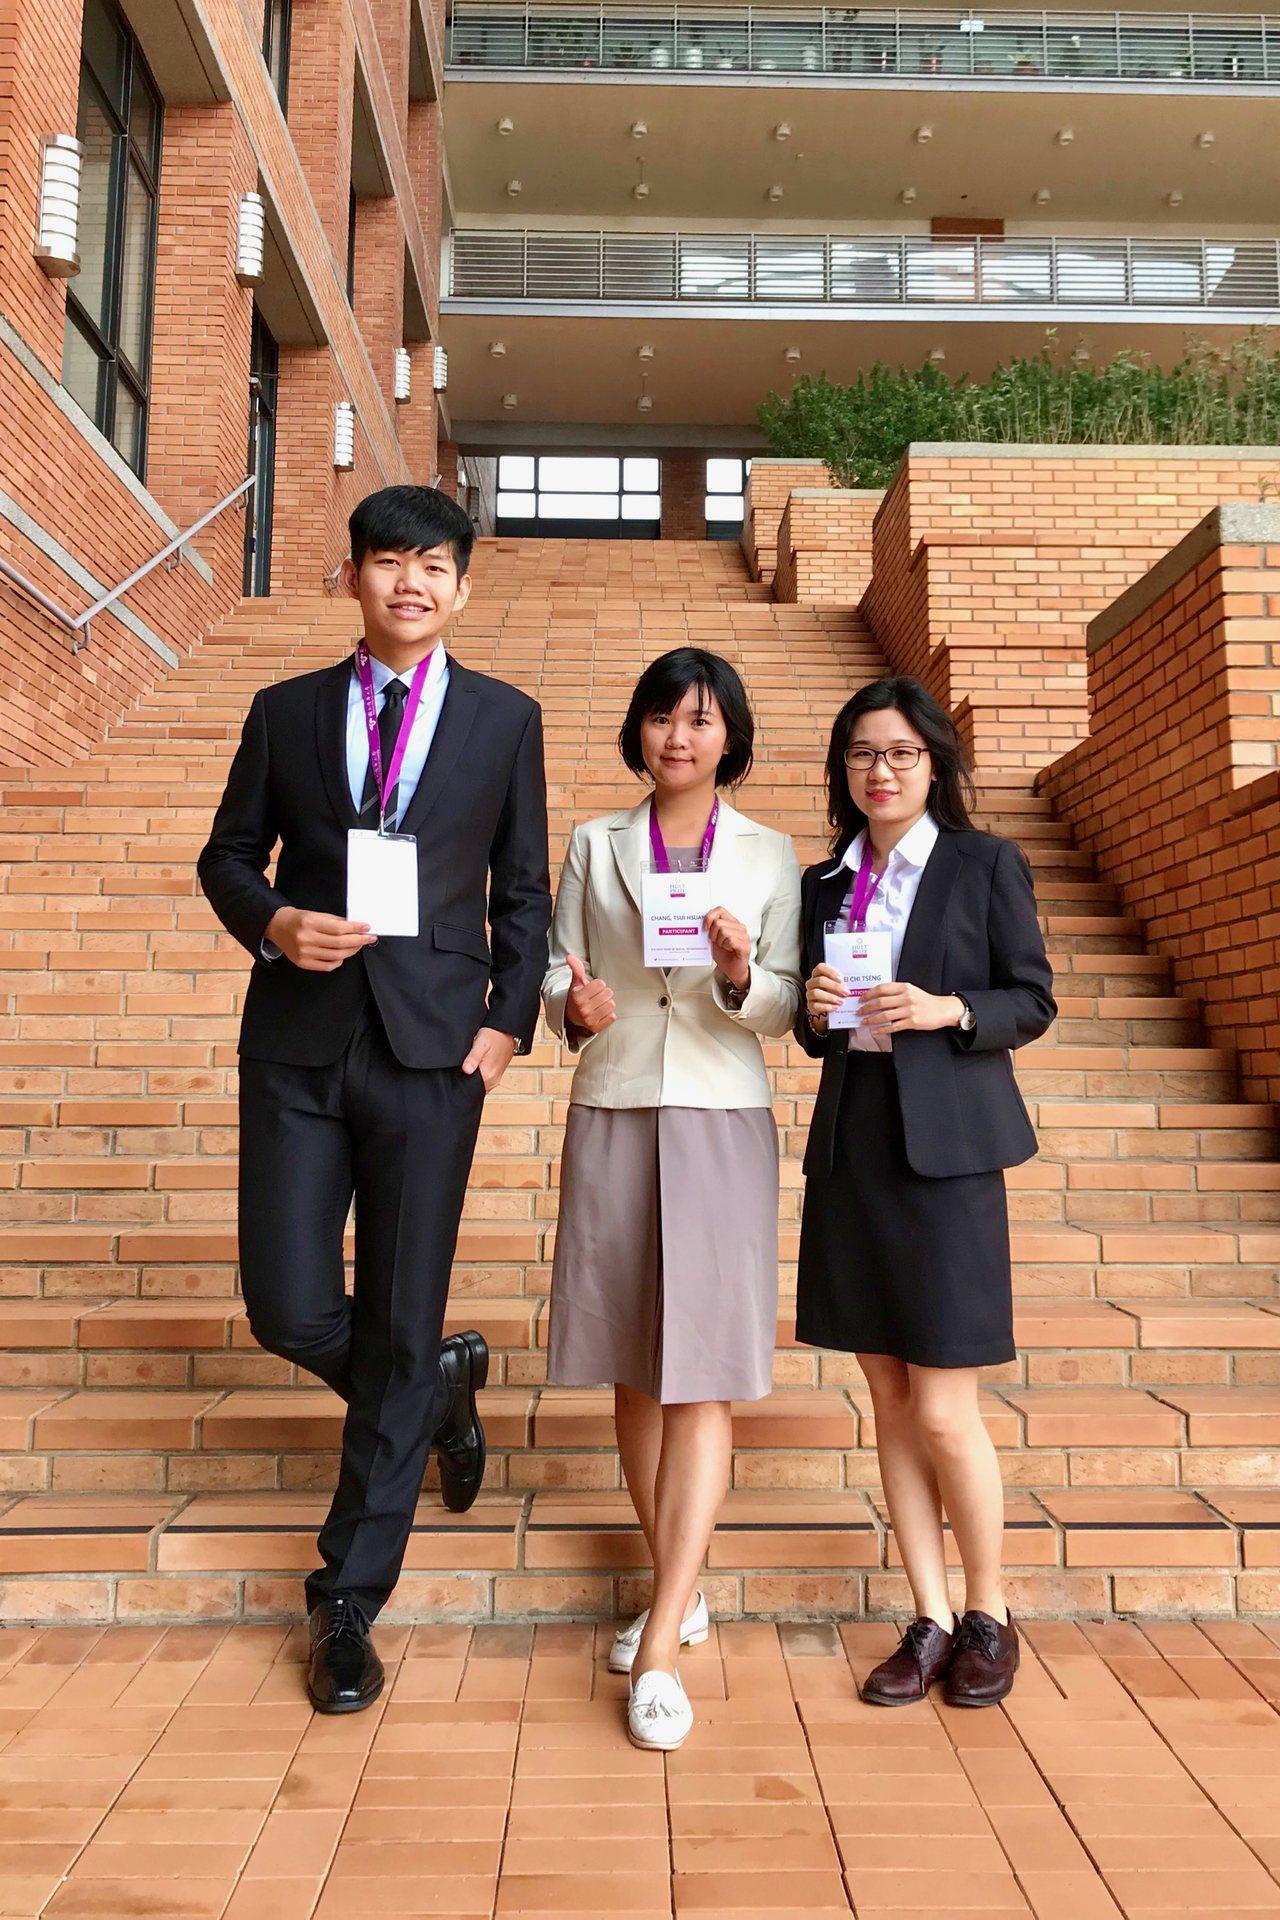 Energene團隊成員陳建廷、張翠璇、曾姵淇(左至右),希望製作有趣的廣播節目...